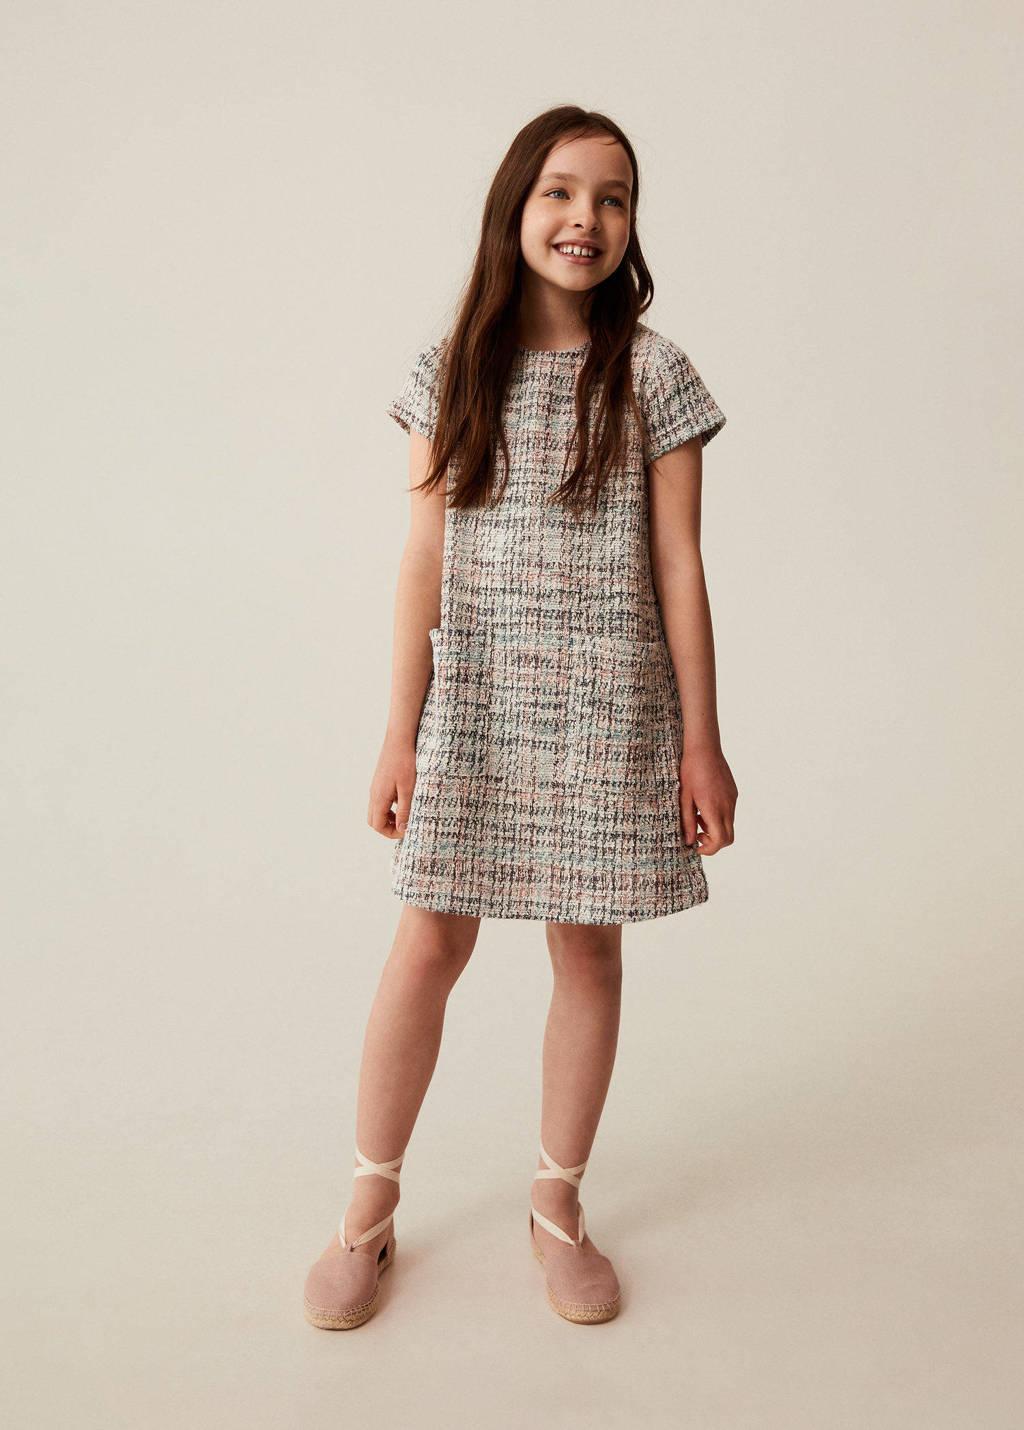 Mango Kids gemêleerde jurk naturel wit/roze/groen, Naturel wit/roze/groen